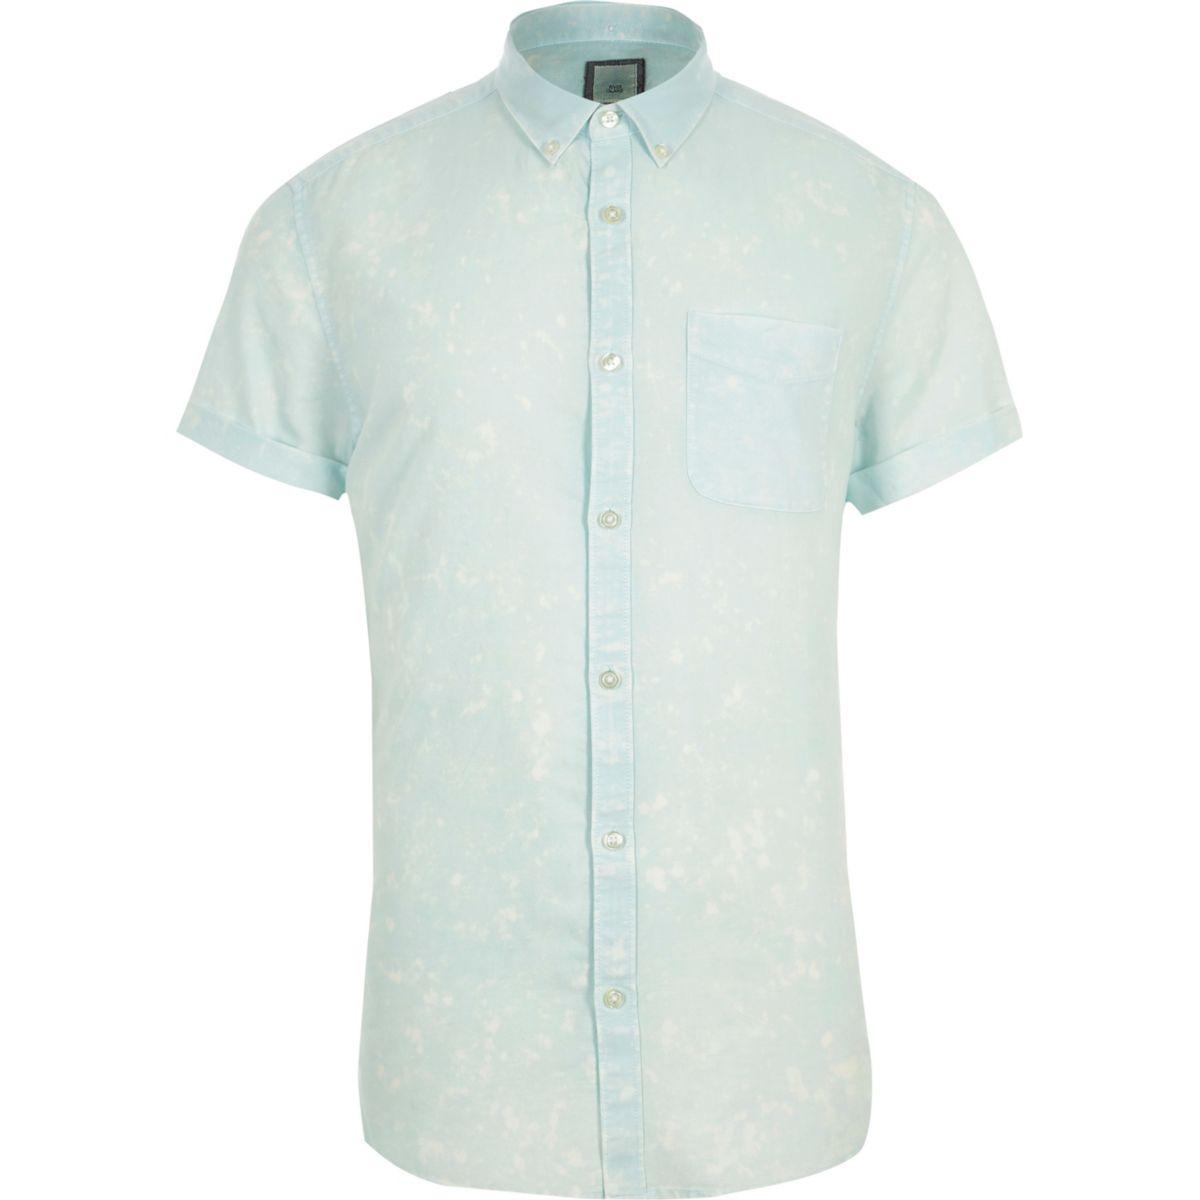 Green acid wash slim fit short sleeve shirt